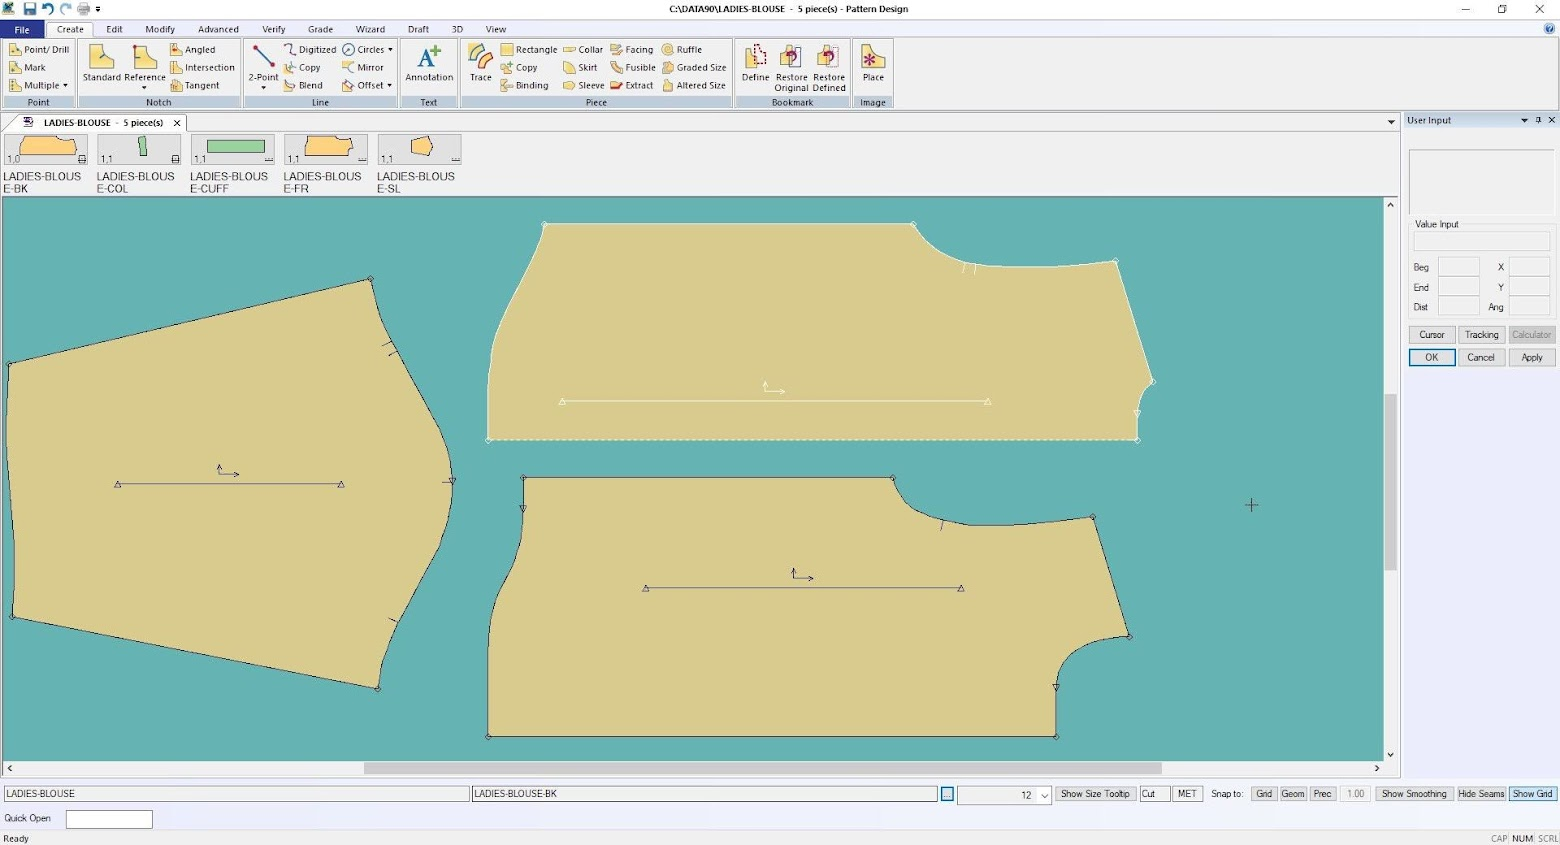 Gerber Pattern Design Point of Measurement: Cách Tạo Bảng Đo Thông Số 4